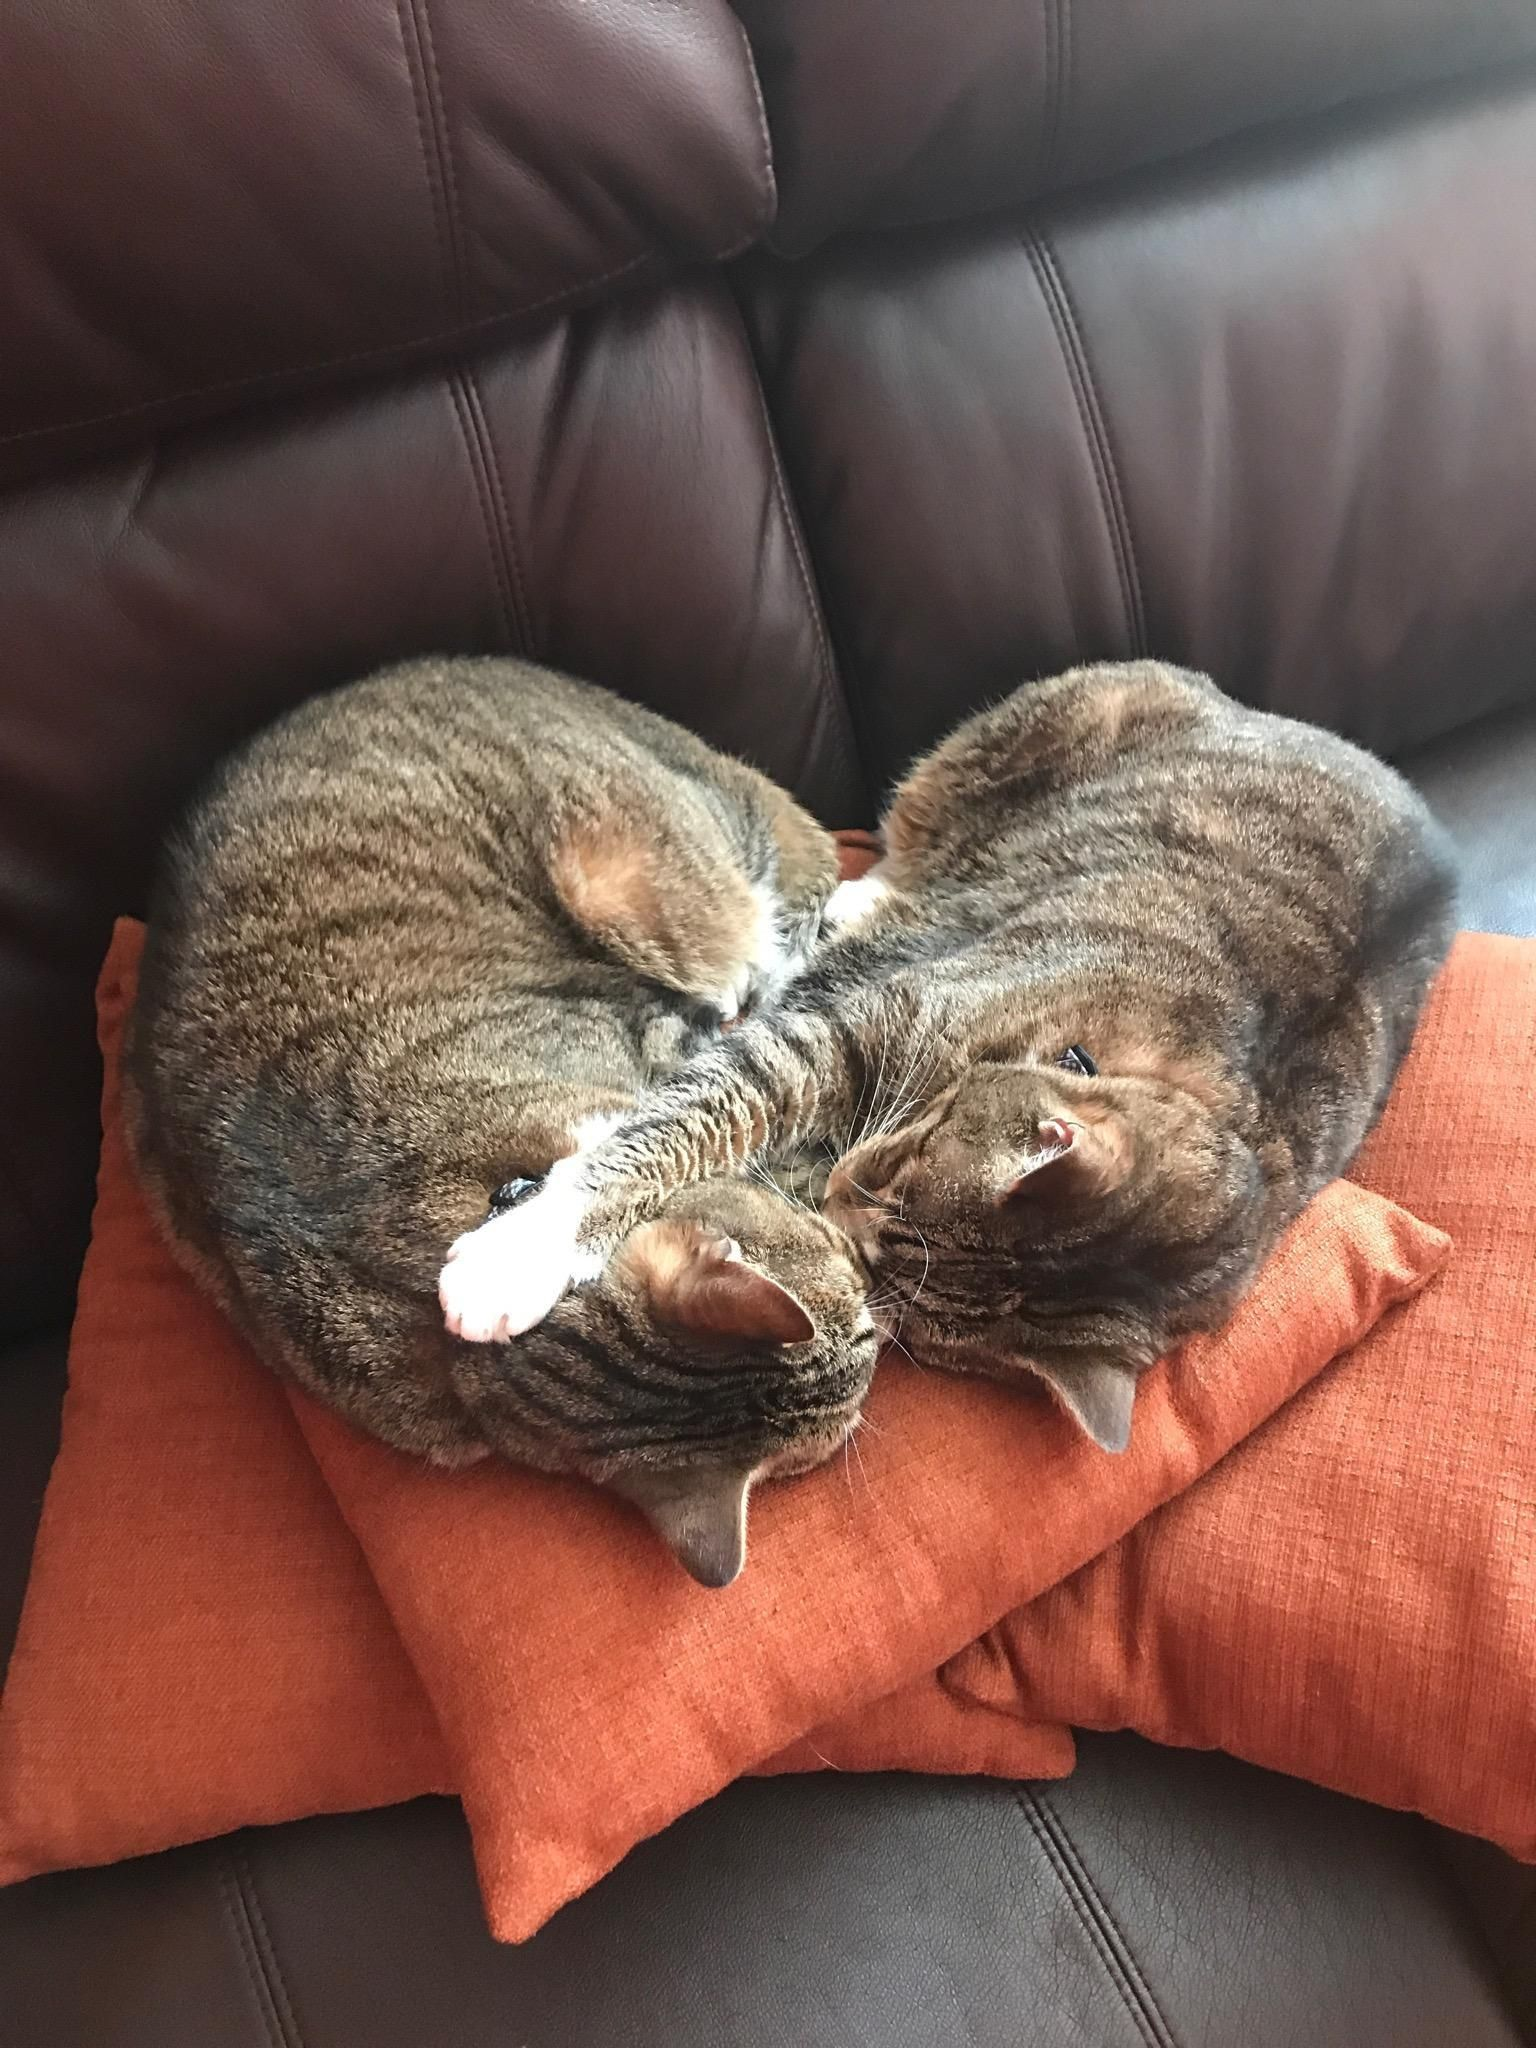 Buddy and Tootsie